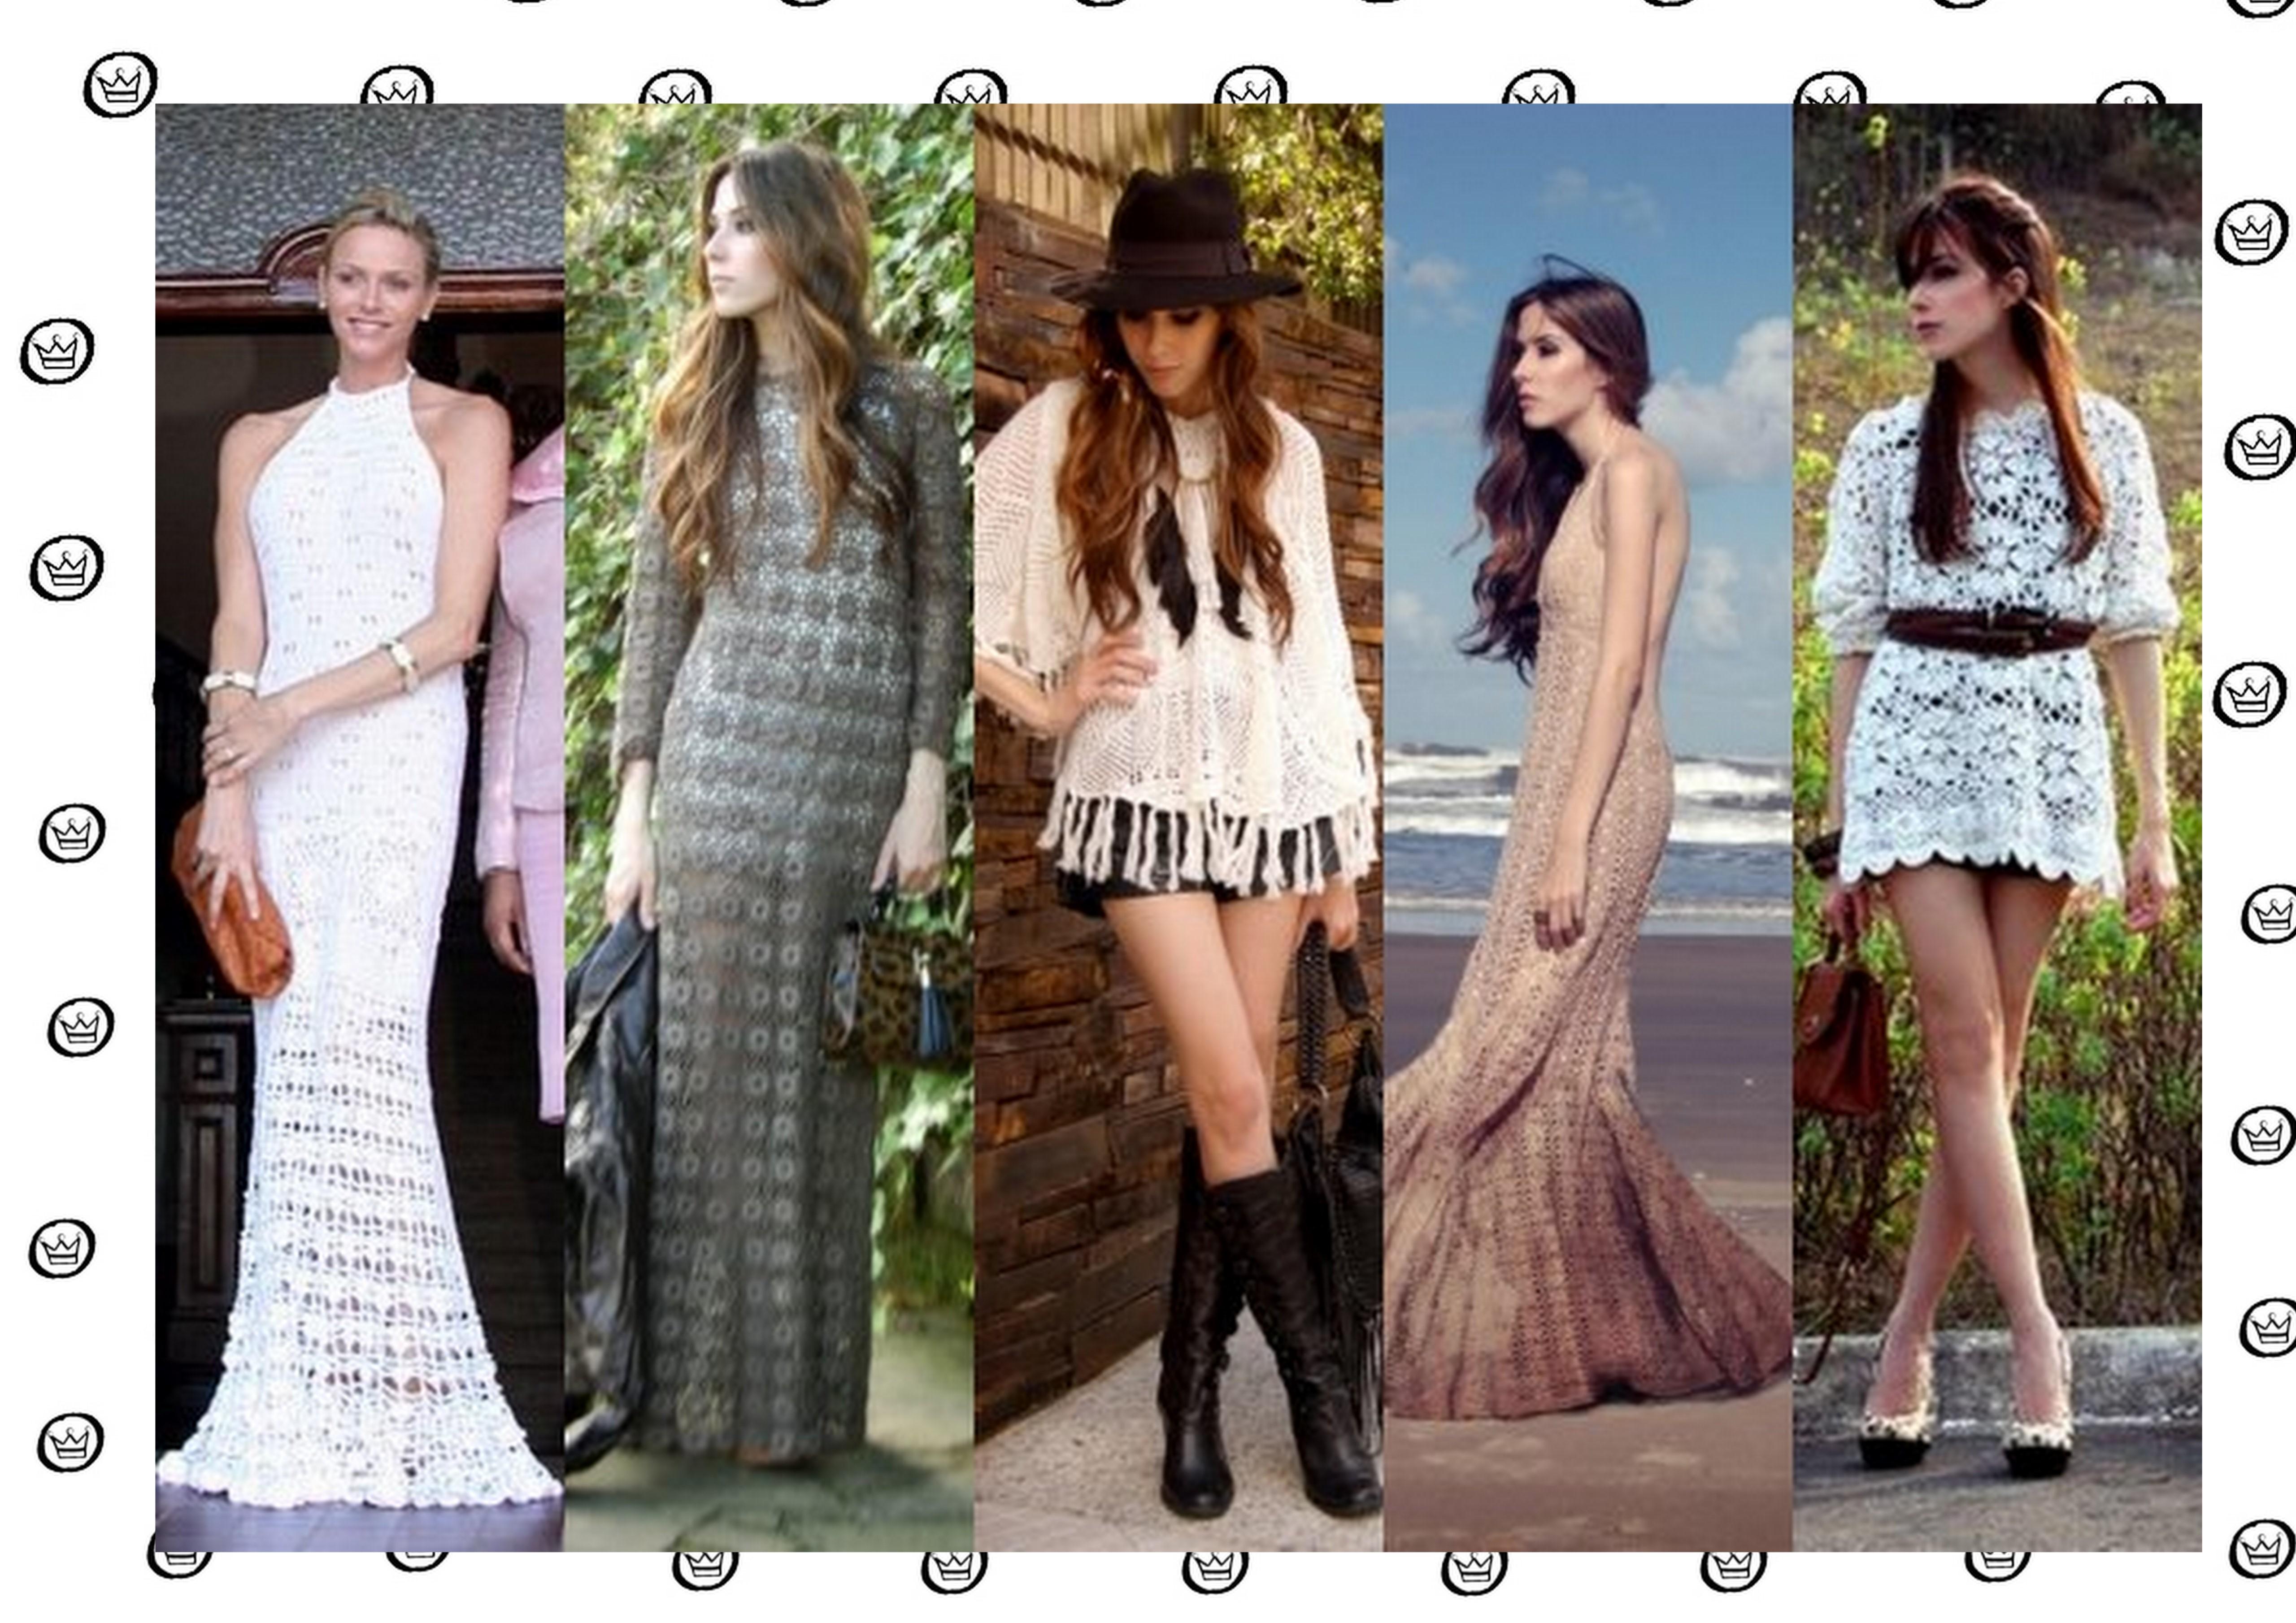 http://fashioncoolture.files.wordpress.com/2011/07/fashioncoolture14.jpg